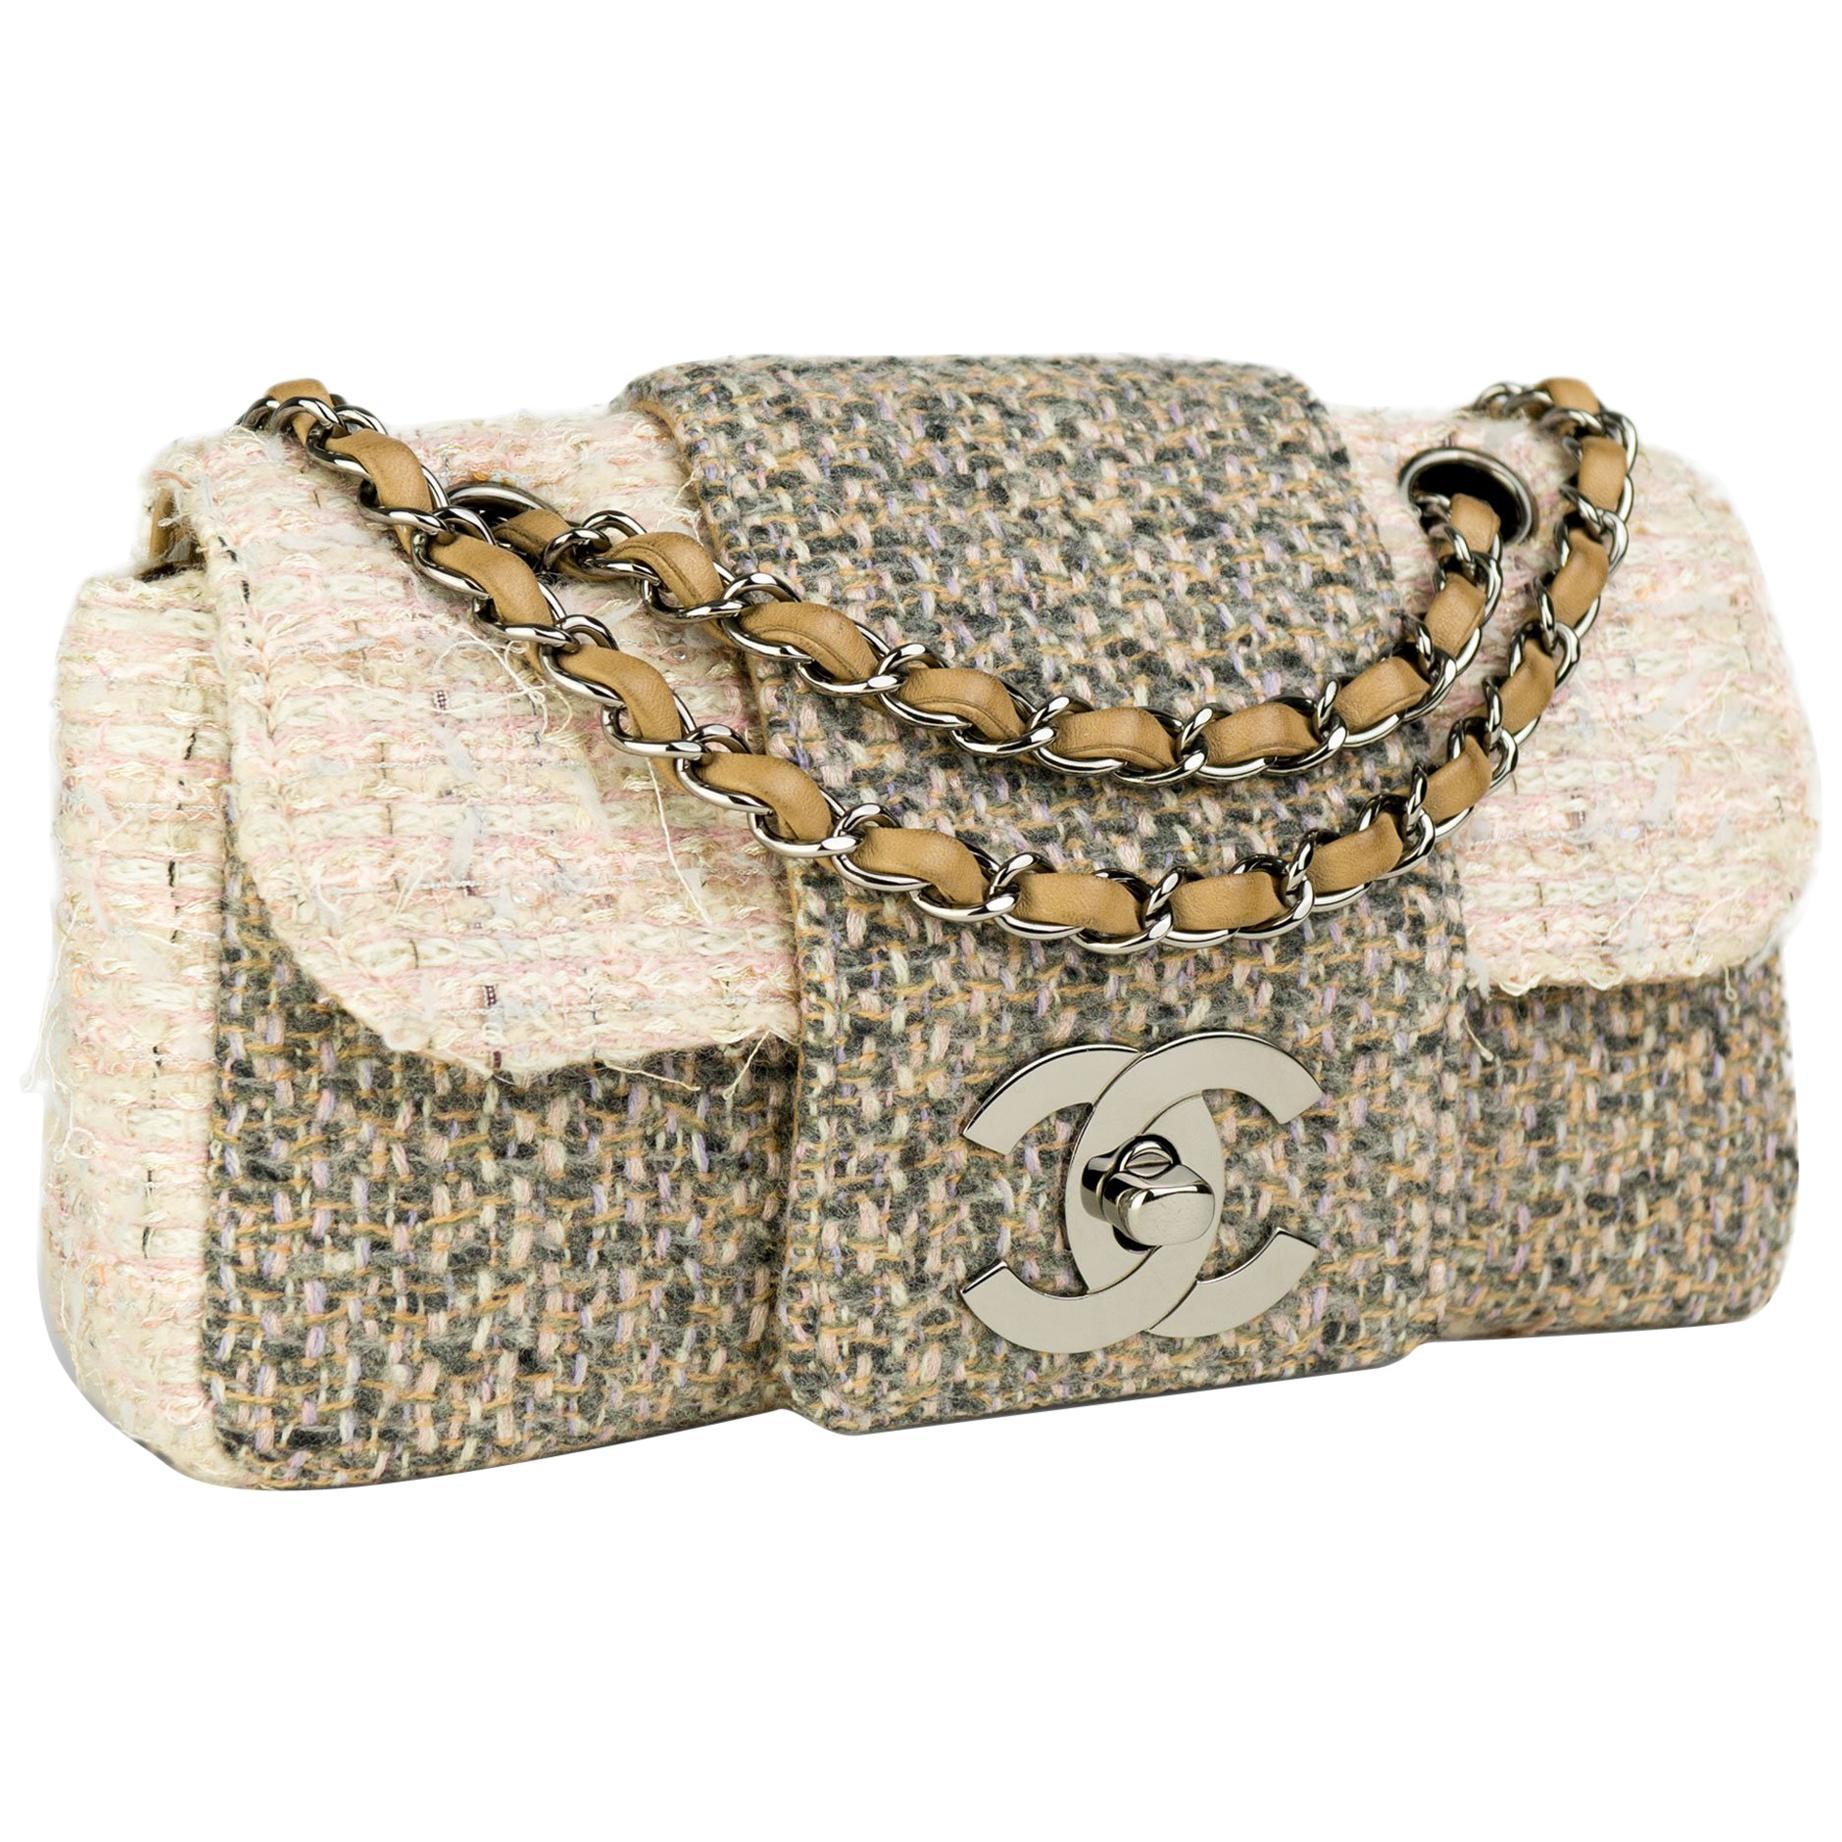 Chanel Small Rare Tweed Cream Beige Classic Flap Bag